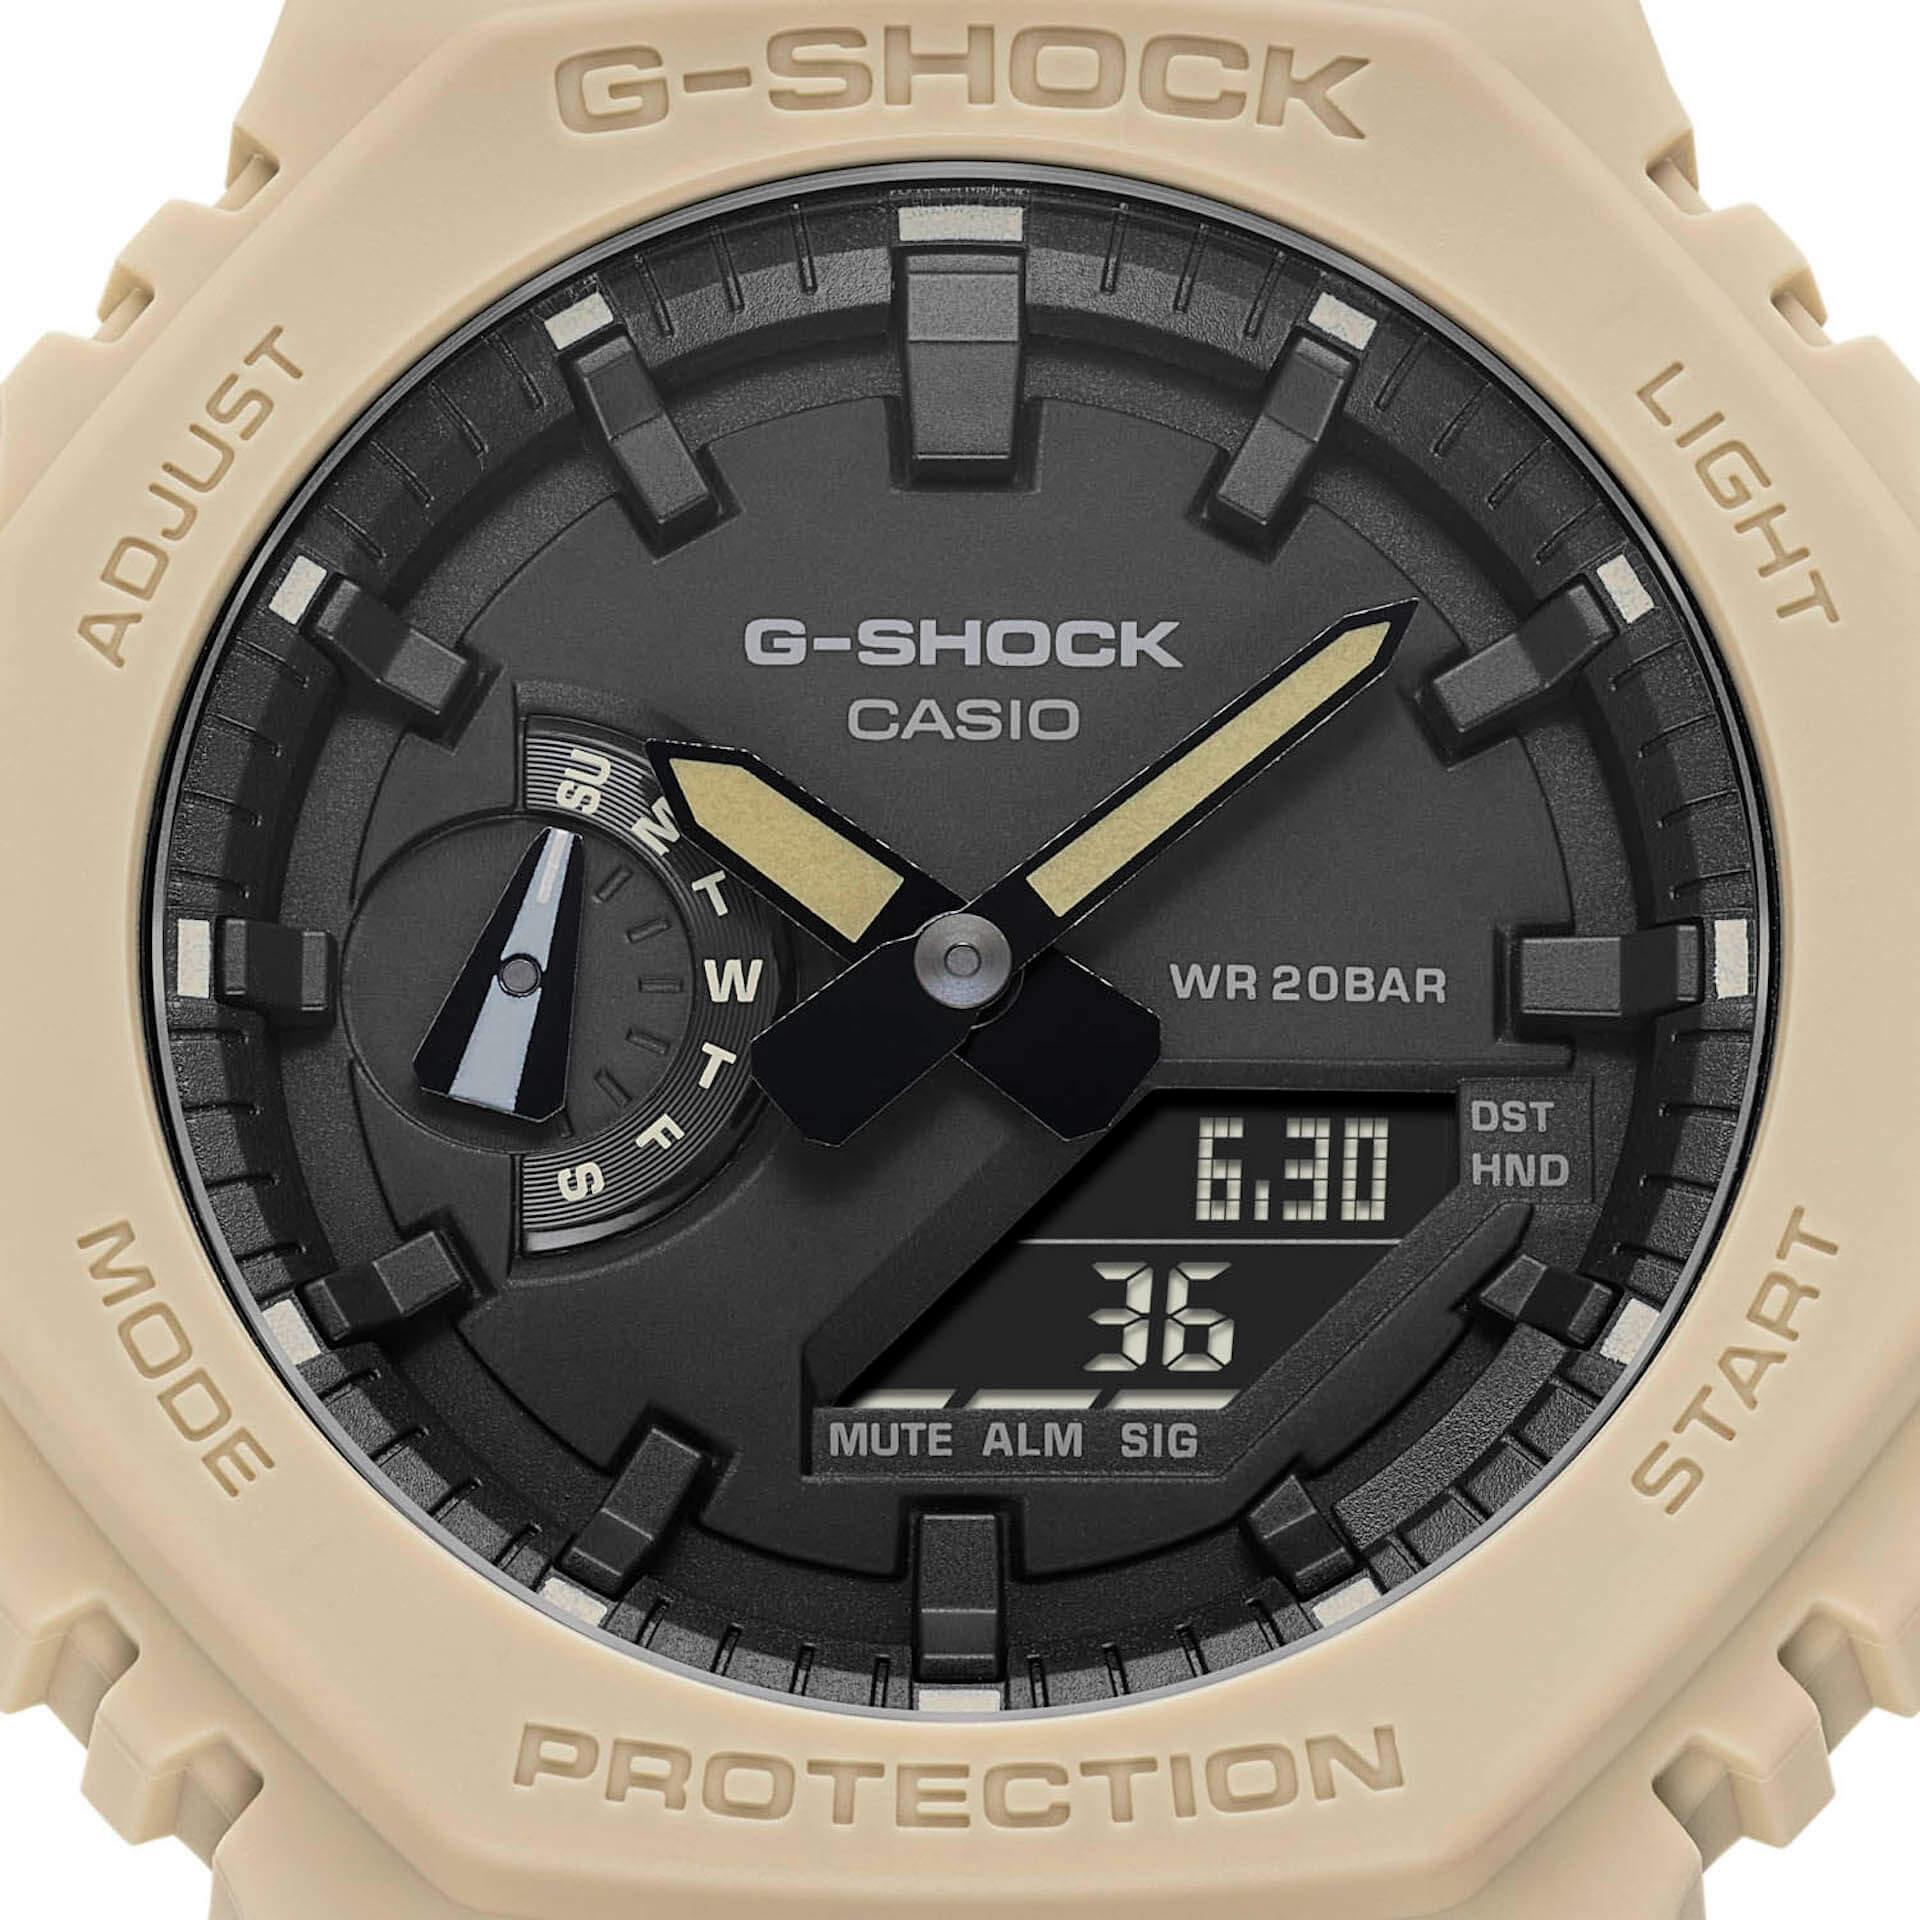 G-SHOCK「GA-2100」シリーズにクラシカルなネイビー、ベージュ、ホワイトの3カラーが登場! tech210805_gshock_ga2100_4